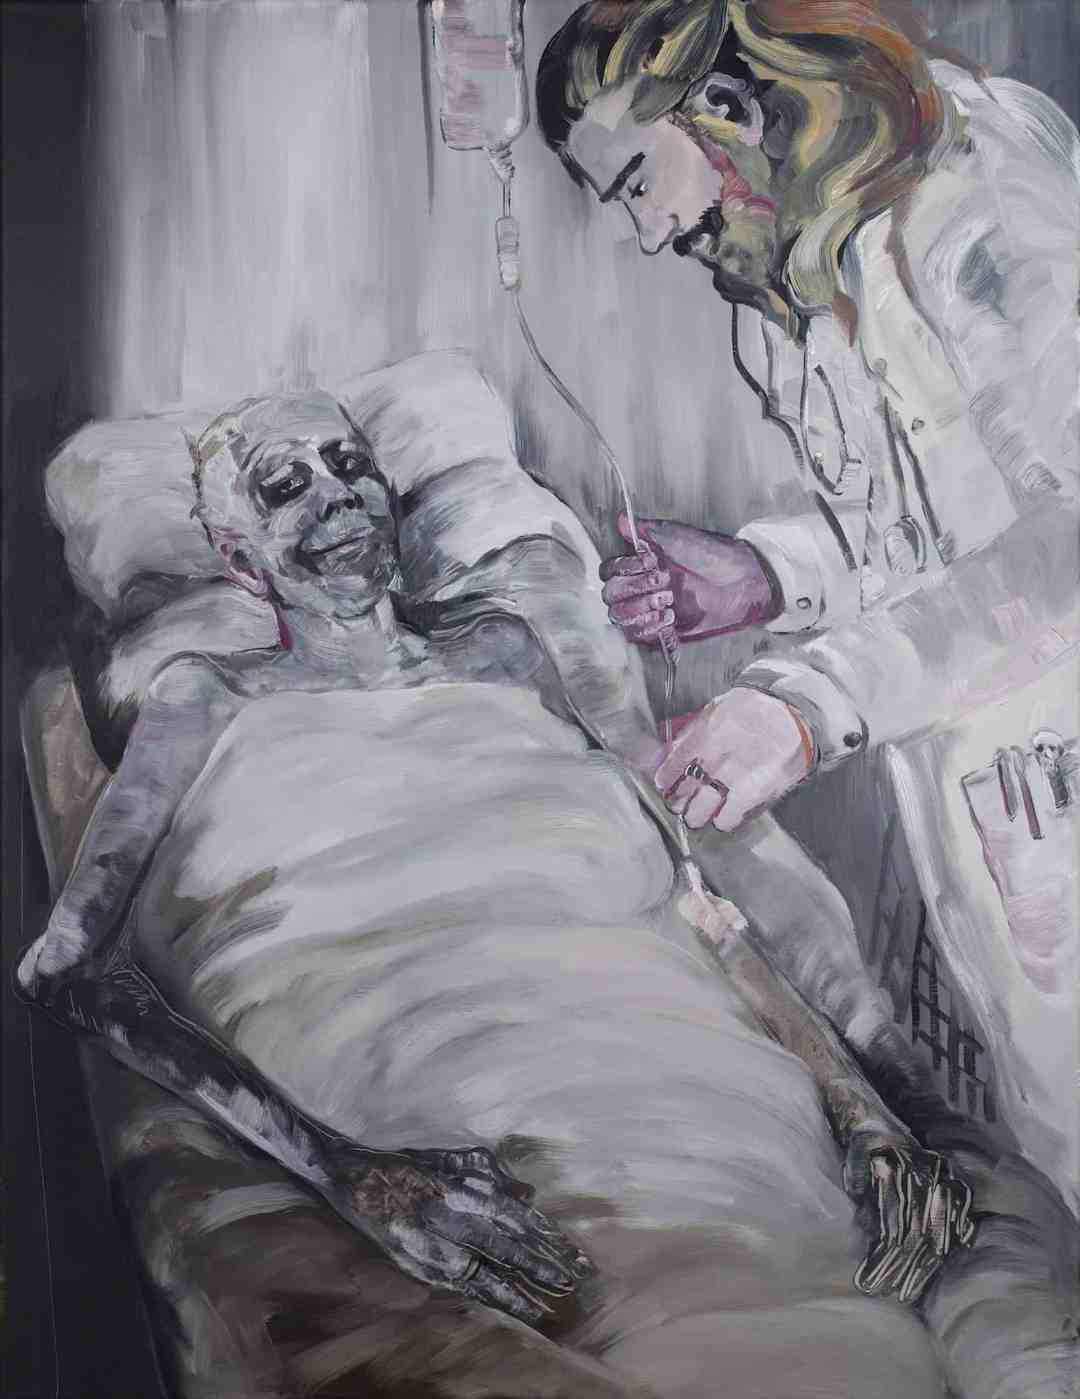 Pola Dwurnik, December, oil on canvas, 116x89cm